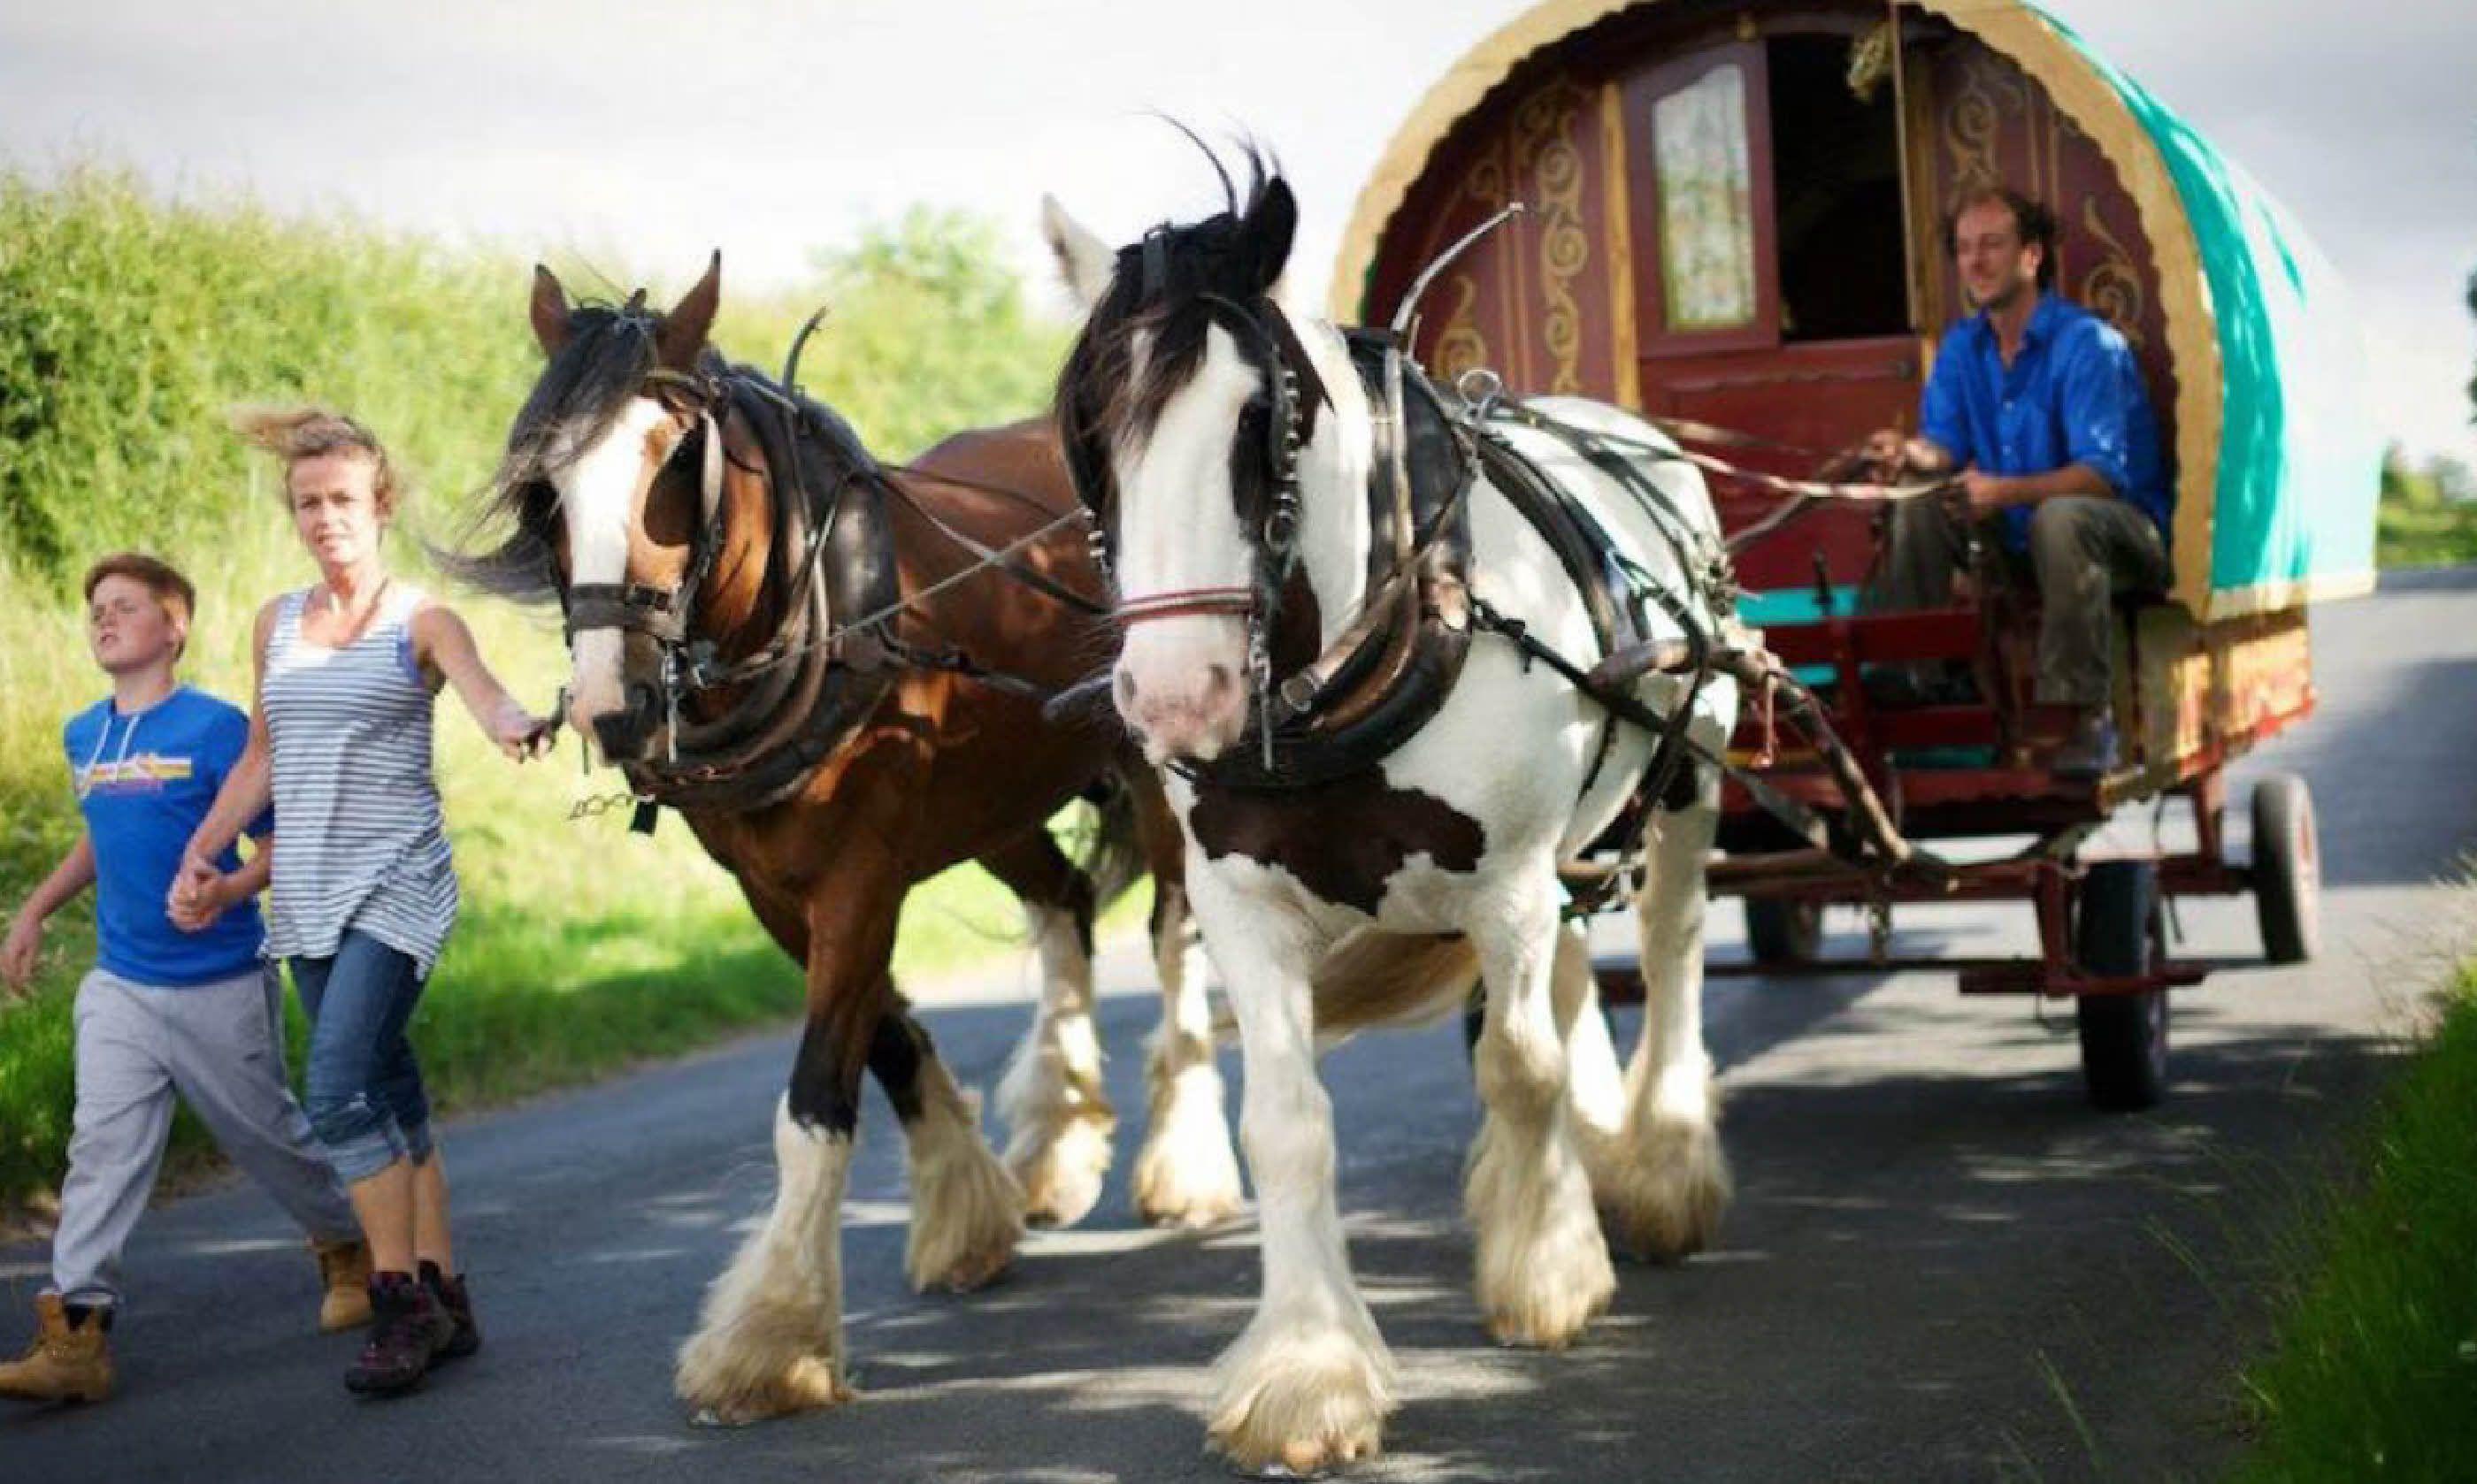 Wanderlusts gypsy caravans, Cool Camping